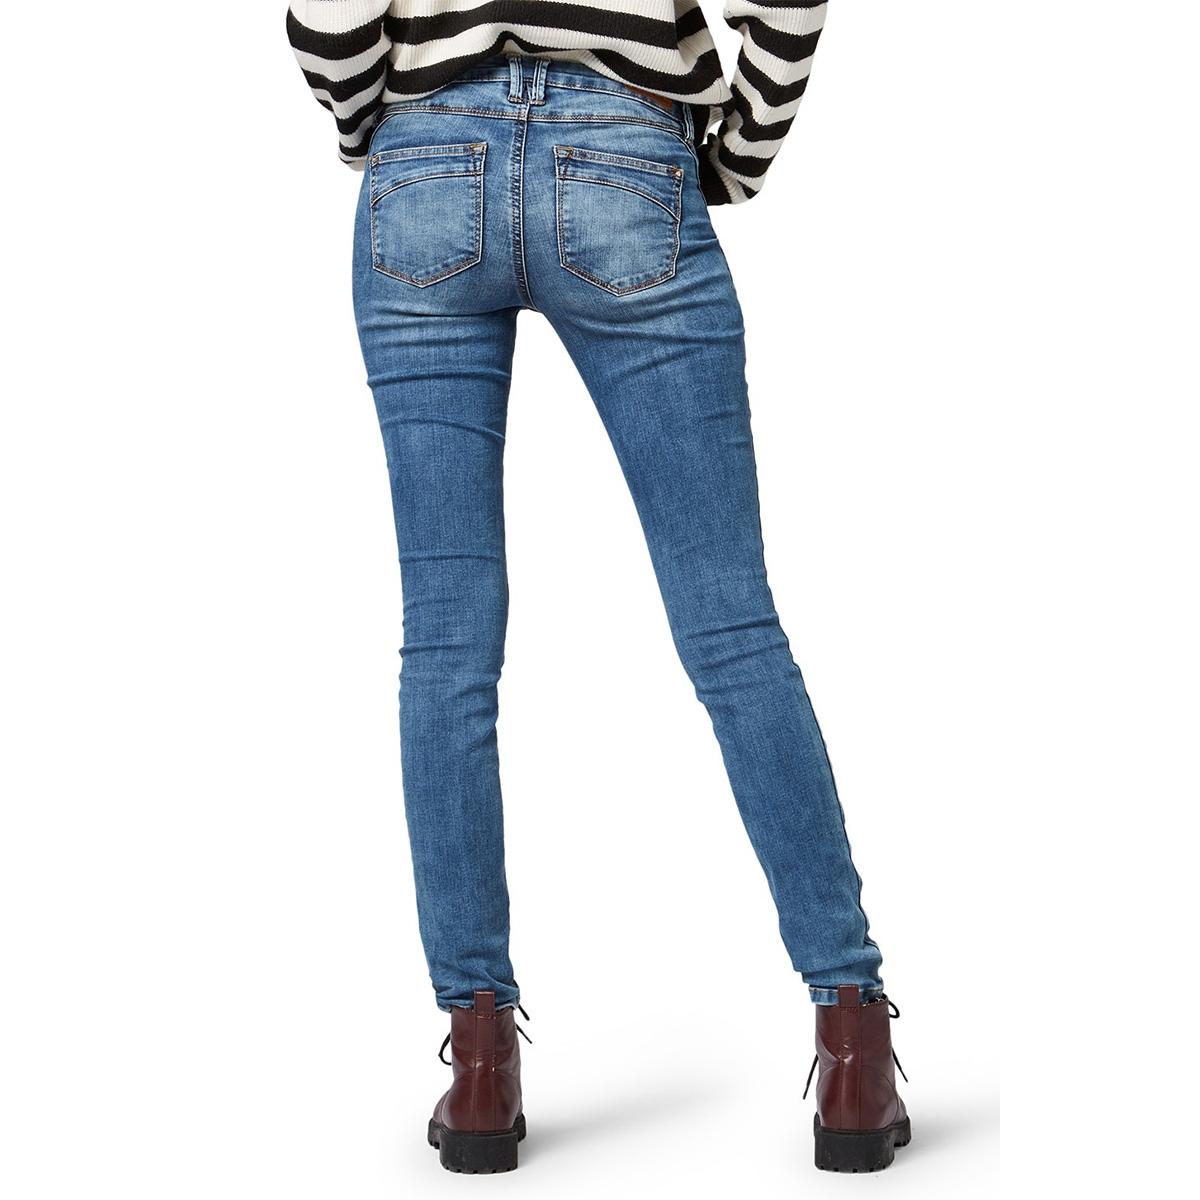 jona extra skinny jeans 1004705xx71 tom tailor jeans 10281